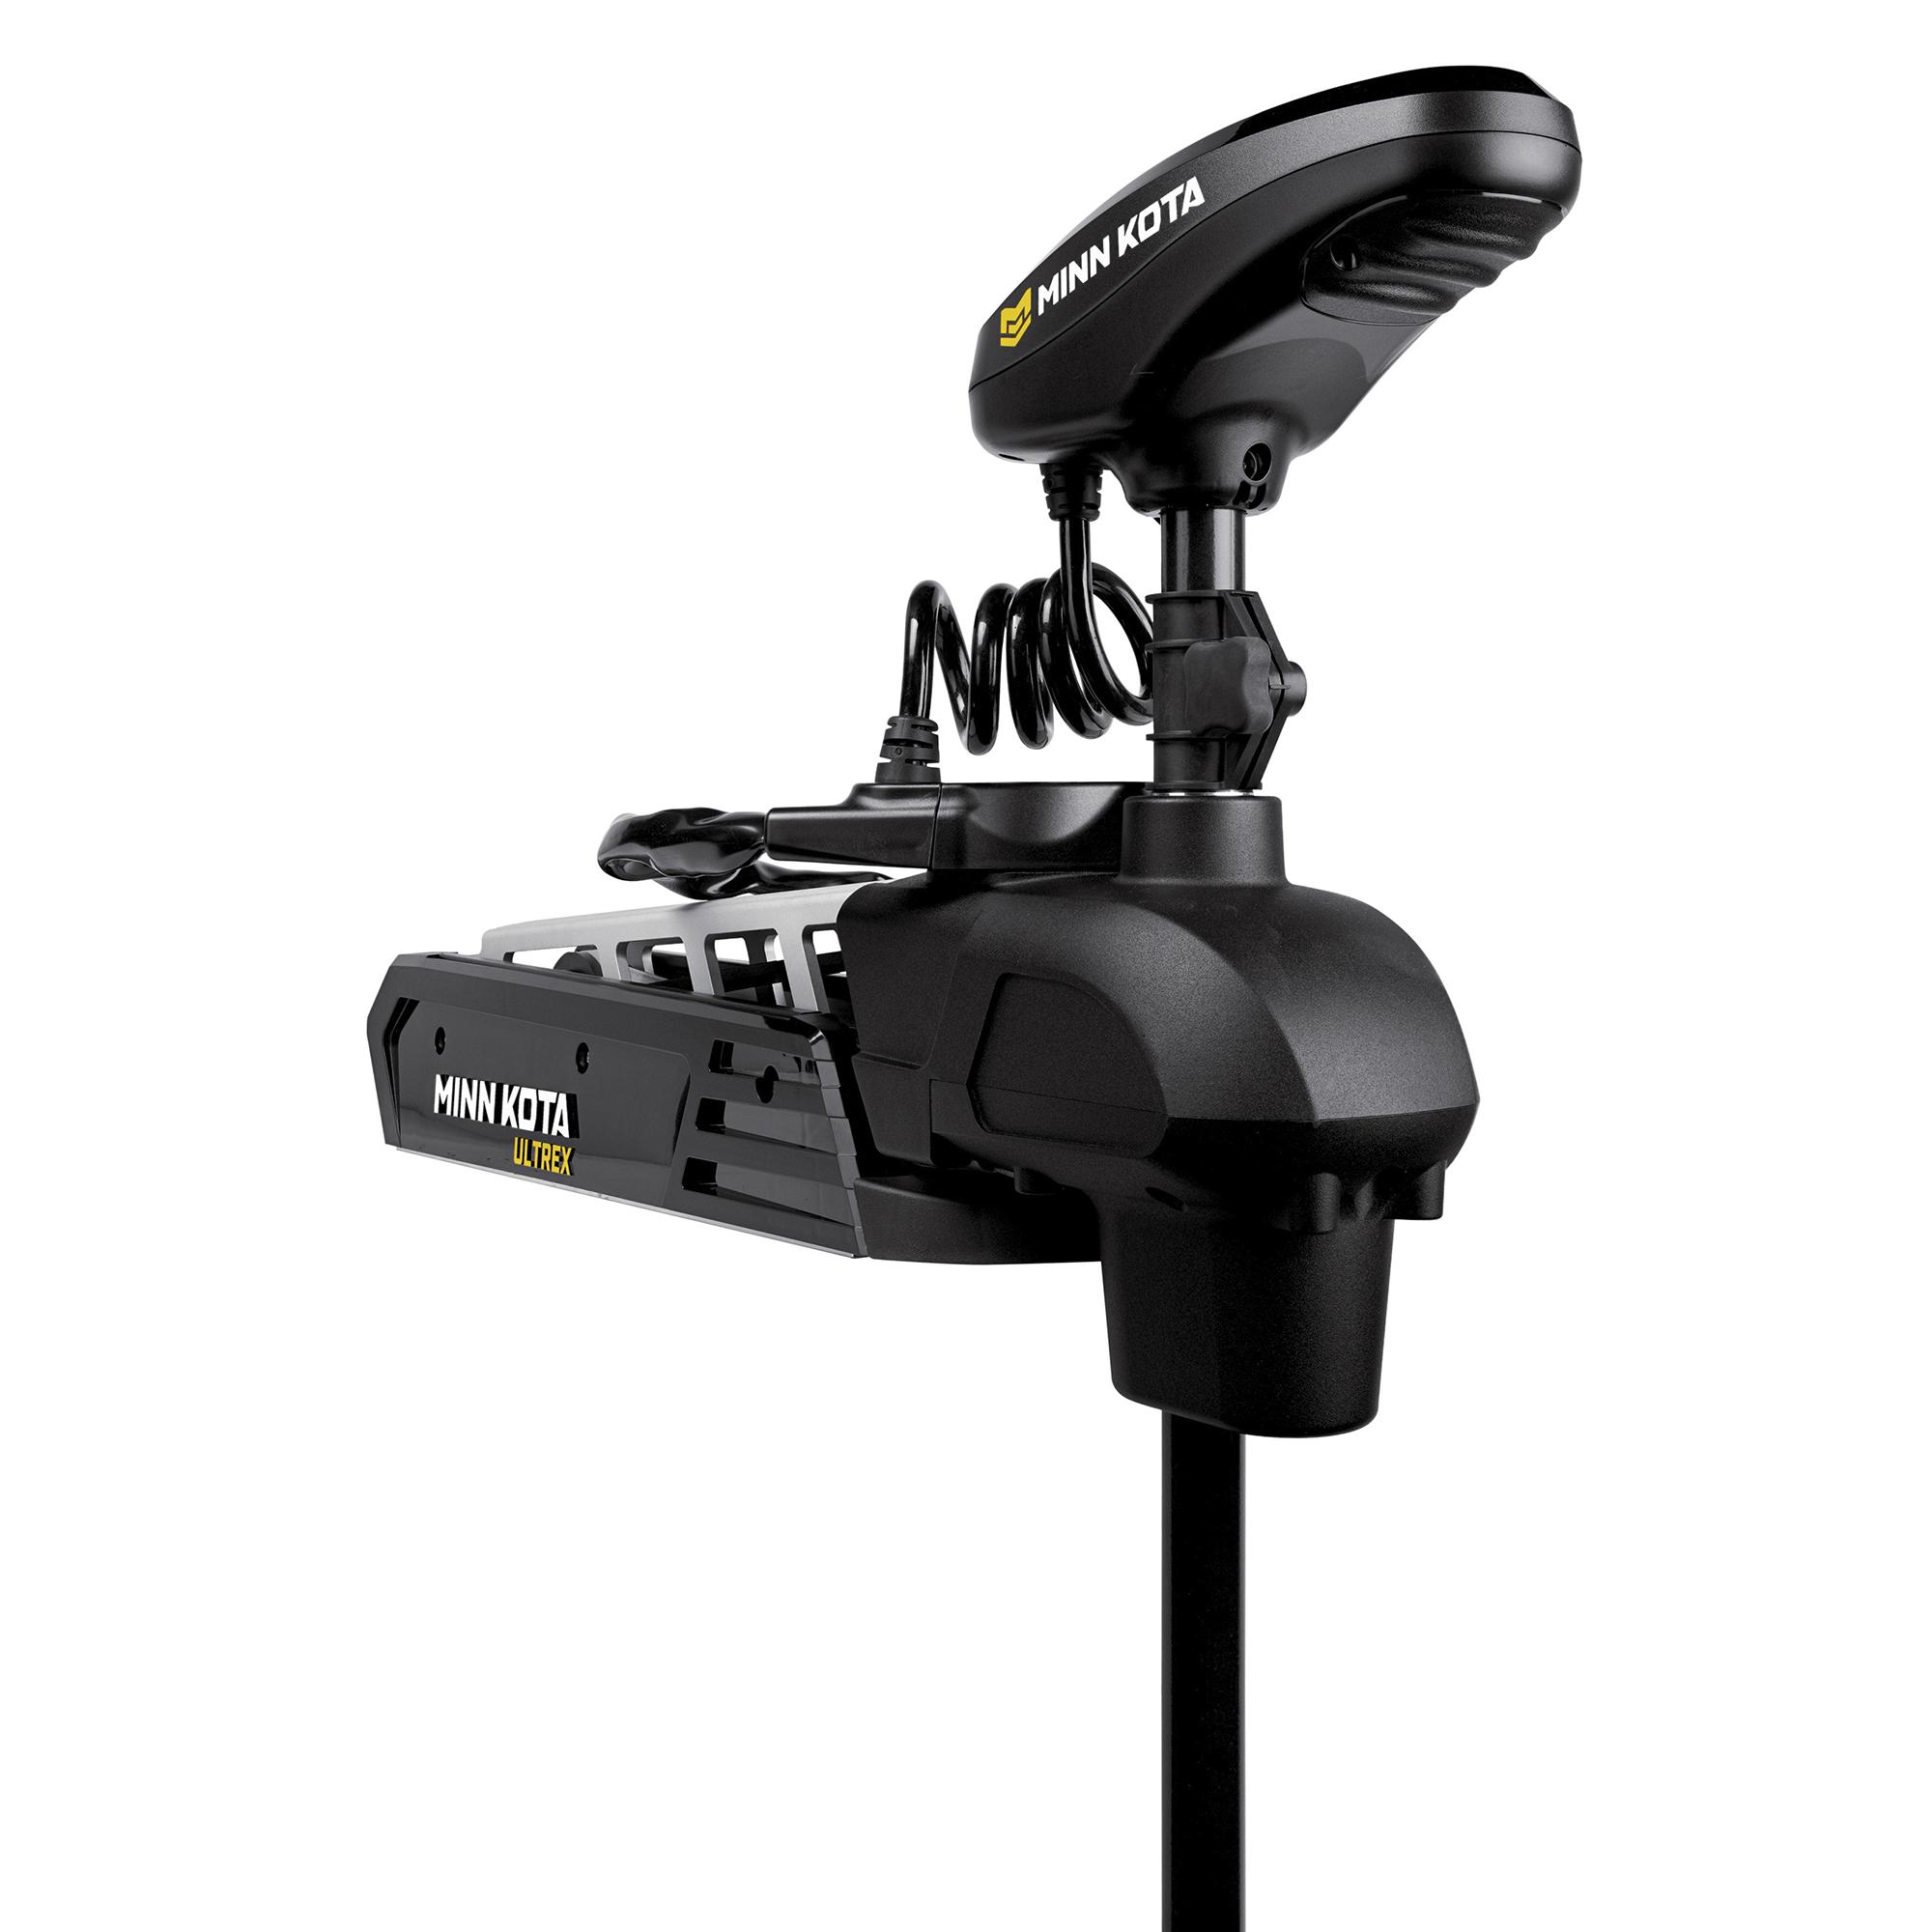 "Minn Kota Ultrex Mega Down Imaging i-Pilot Freshwater Bow-Mount Trolling Motor, 45"""